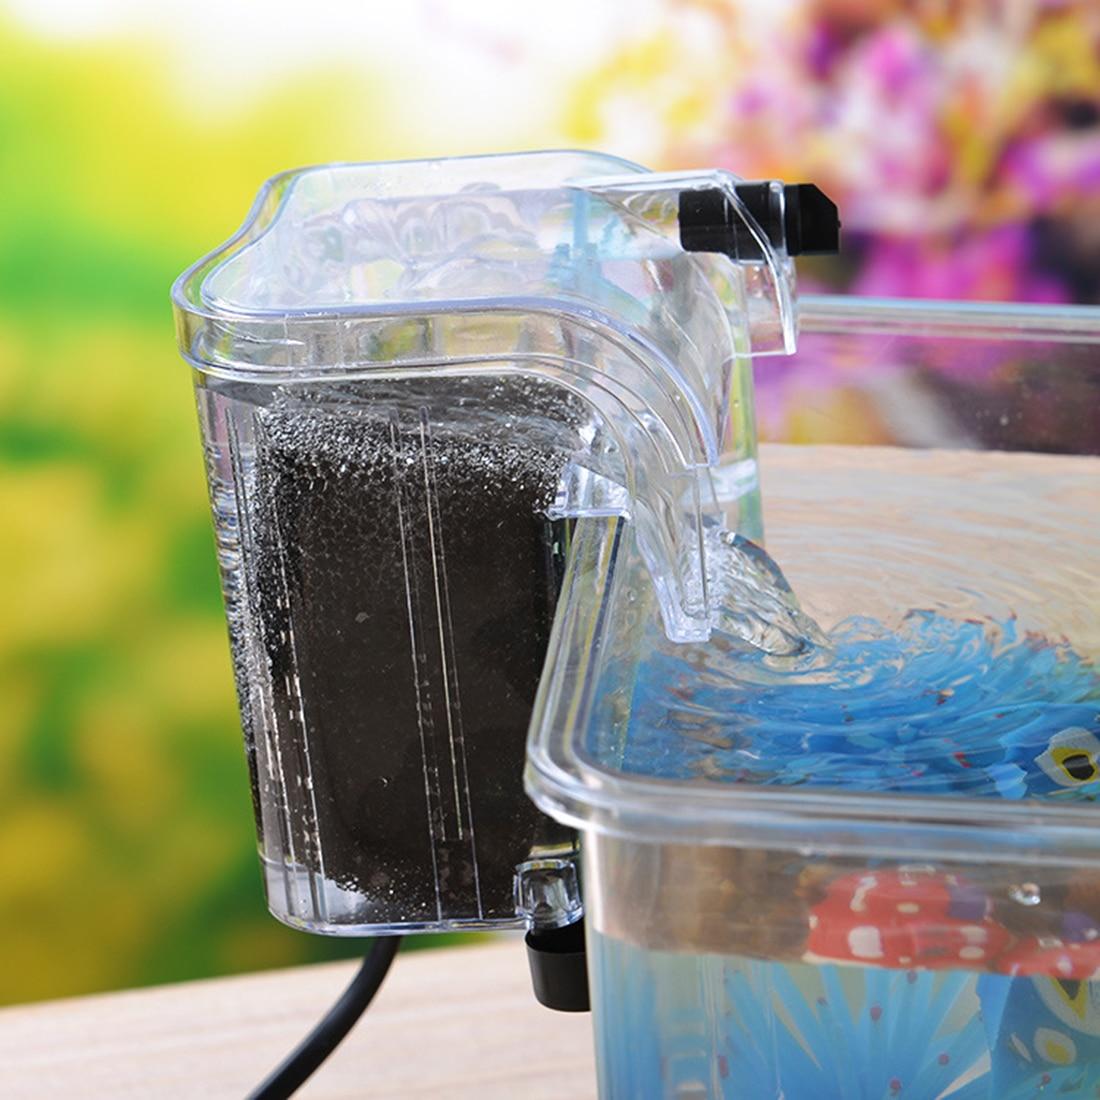 3 In 1 Sinking Pump Blunt Oxygen Pump External Water Purifier Filter For Mini Fish Tank 100% Guarantee